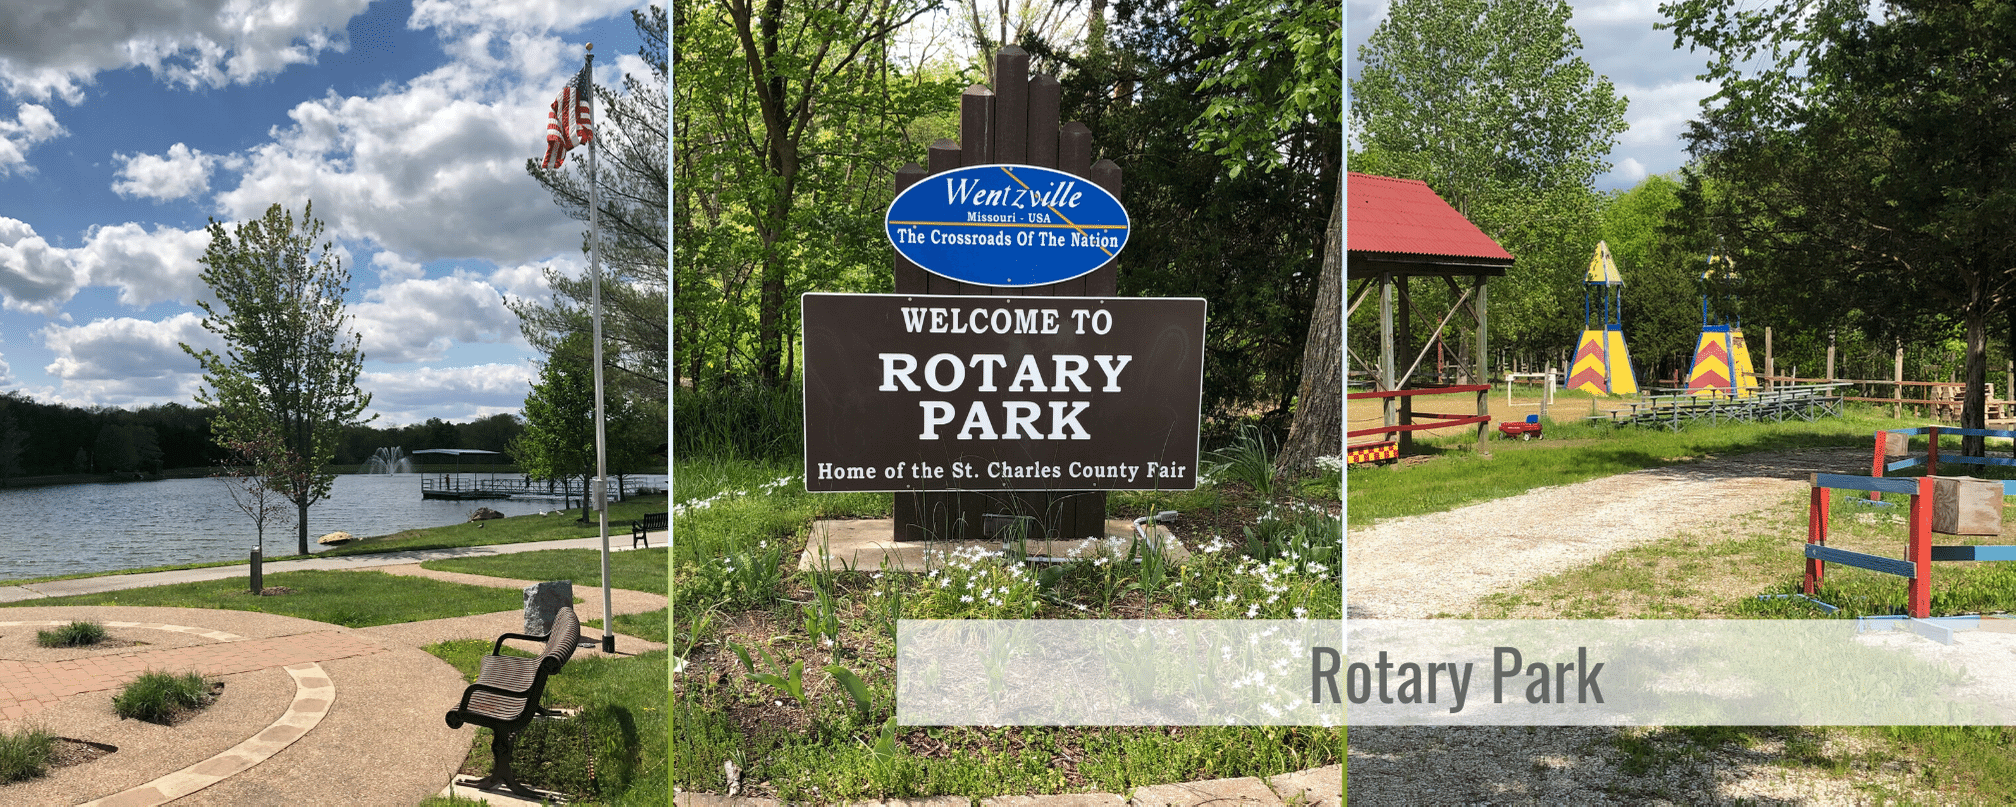 Rotary Park Foristell